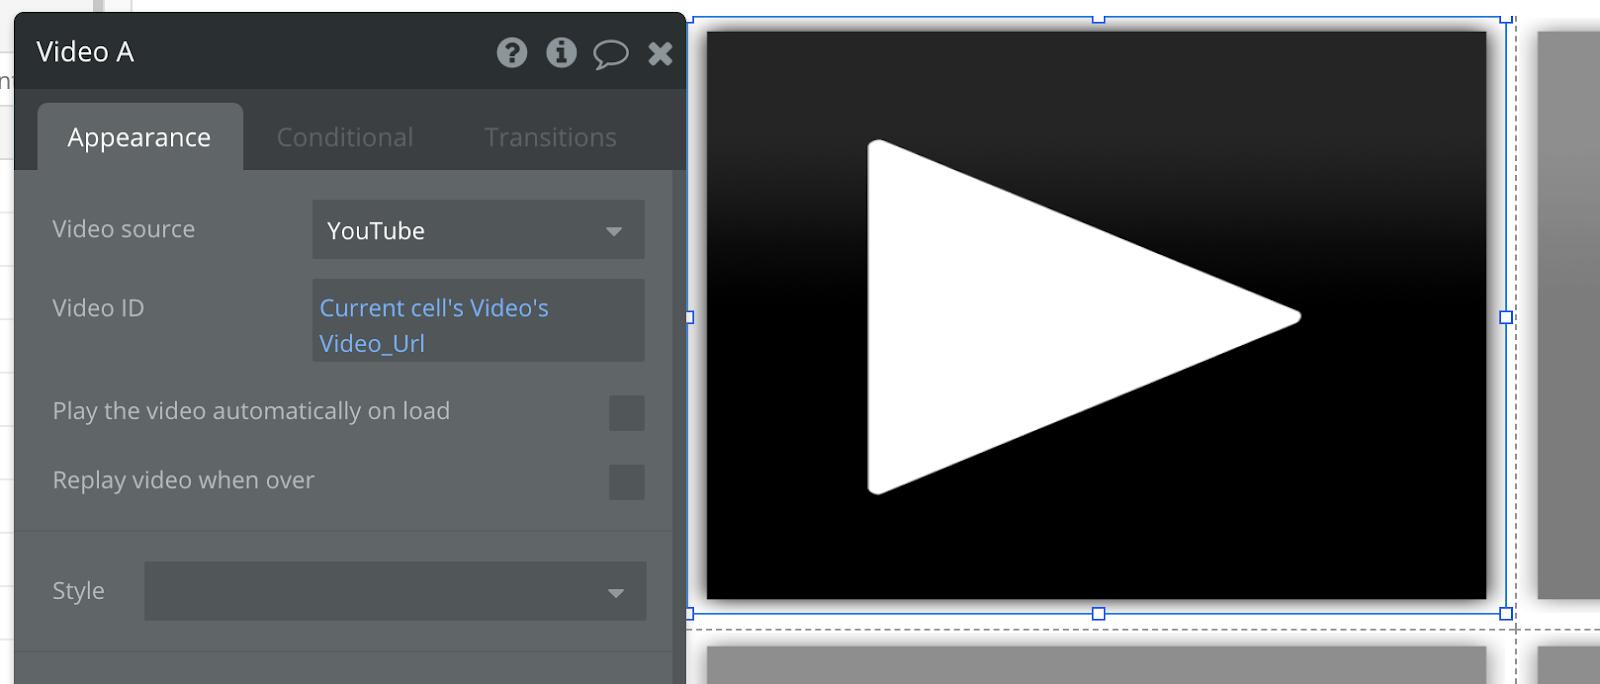 Bubble no code Youtube clone tutorial walkthrough